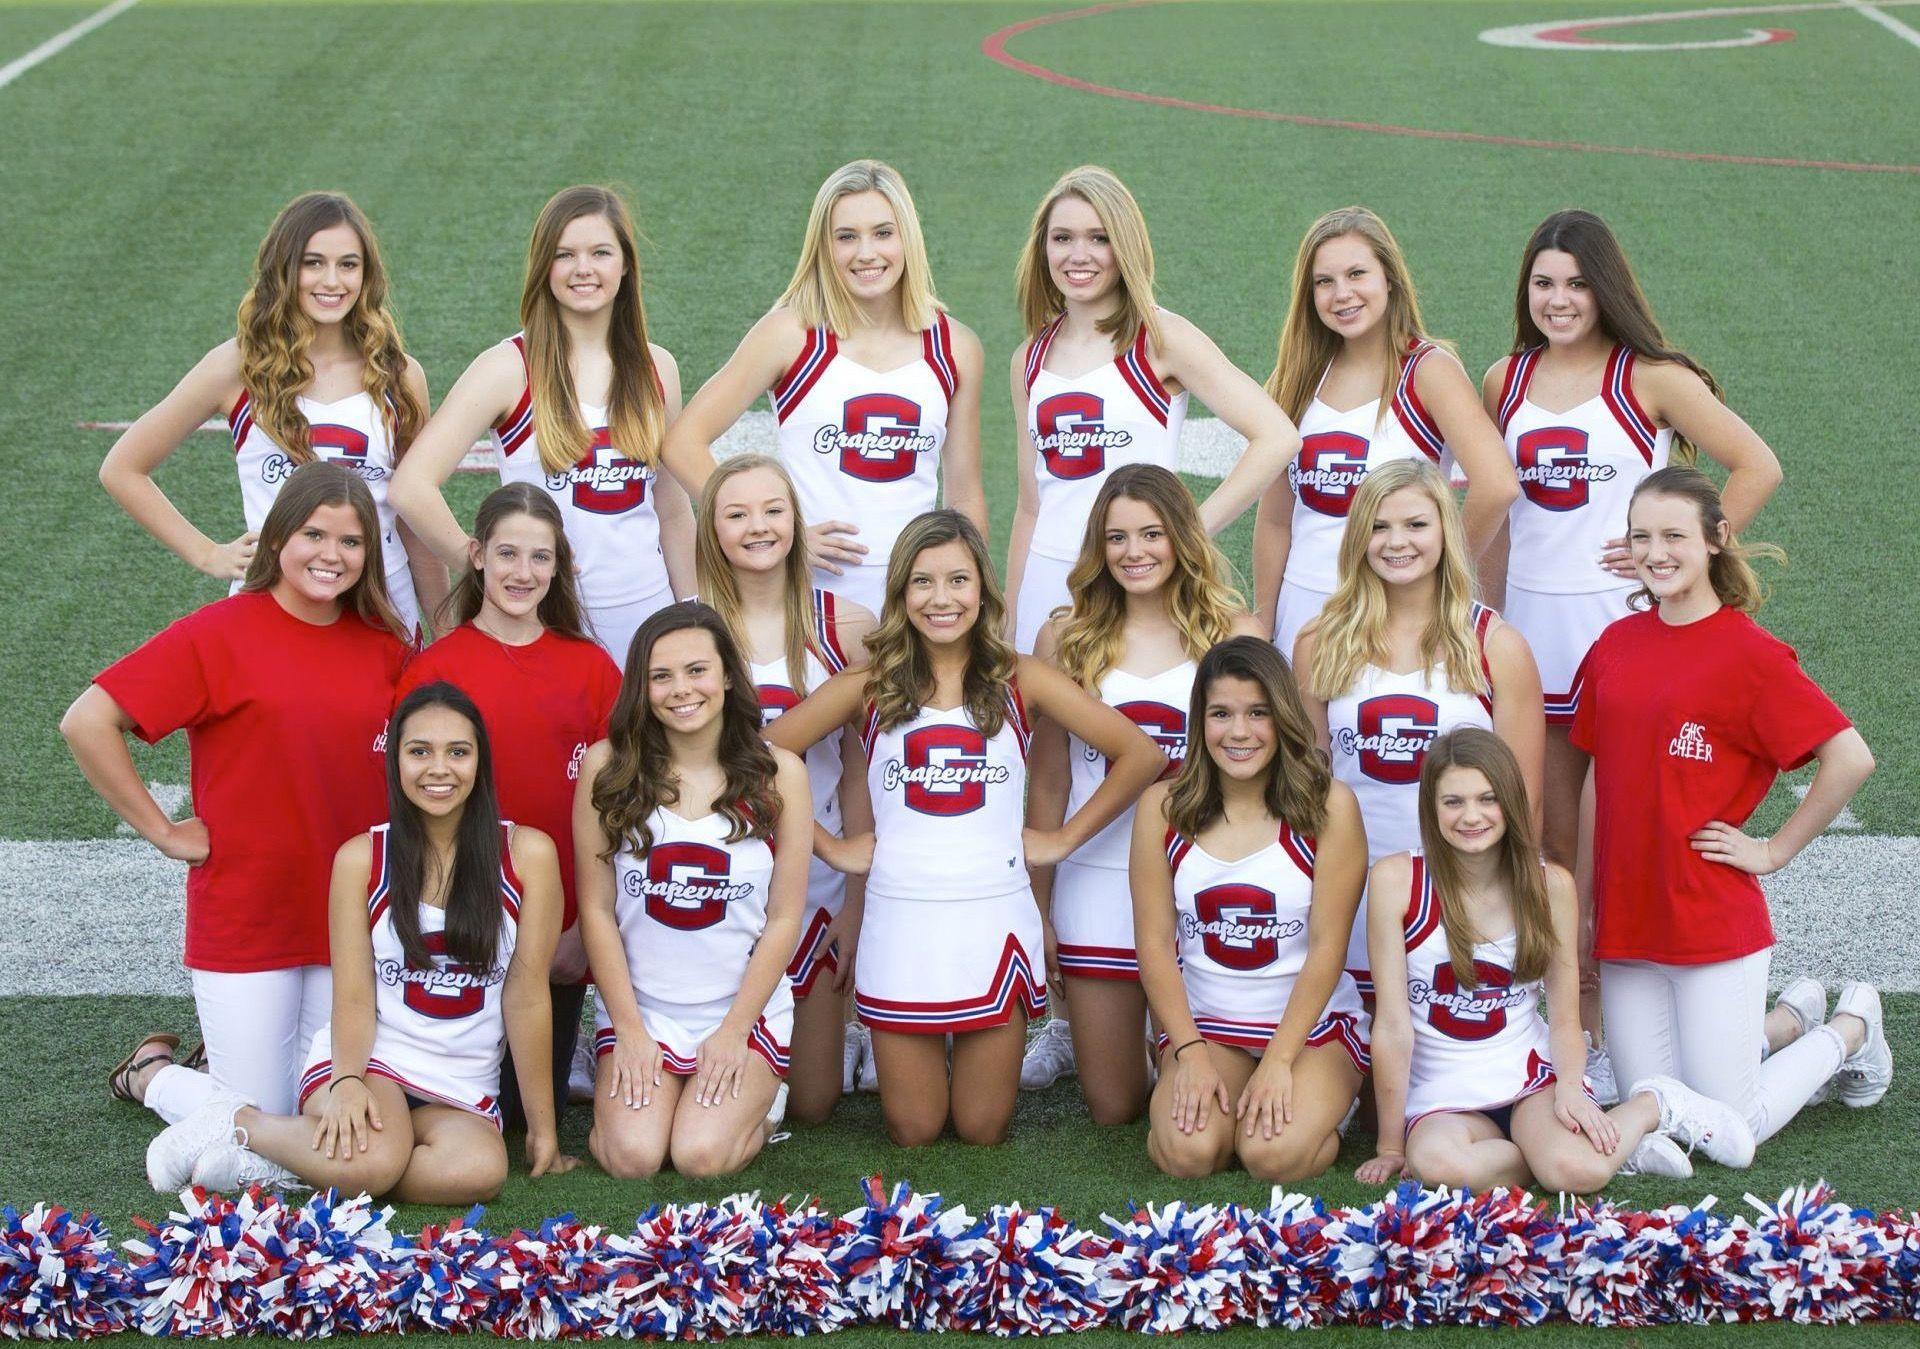 Grapevine High School Junior Cheerleaders (2017-2018)